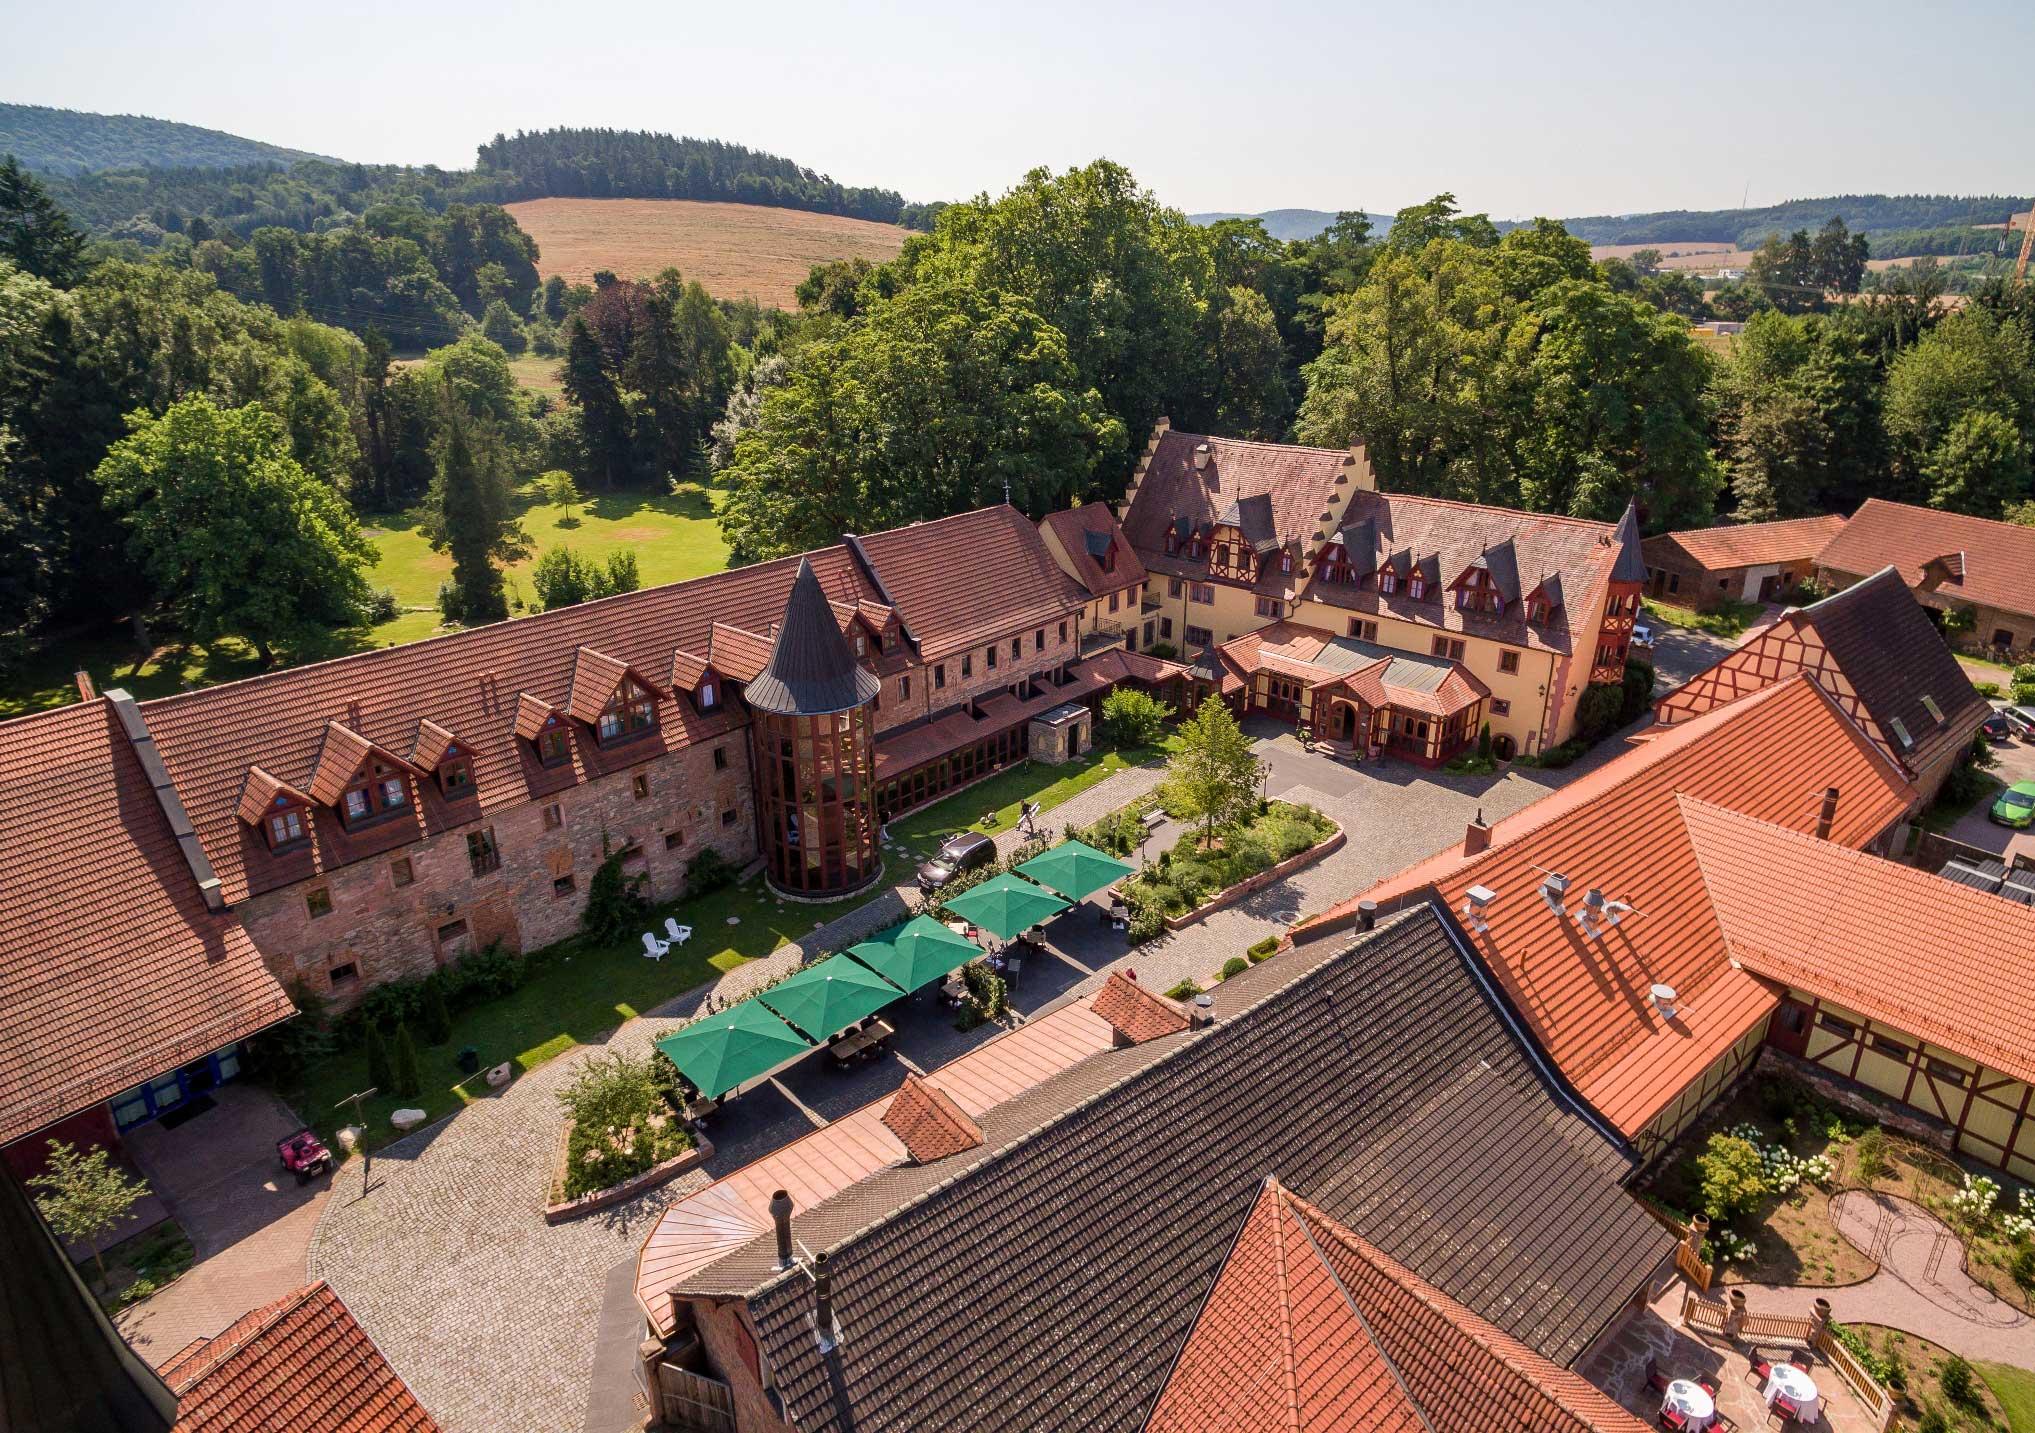 Schlosshotel Weyberhöfe, Spessart